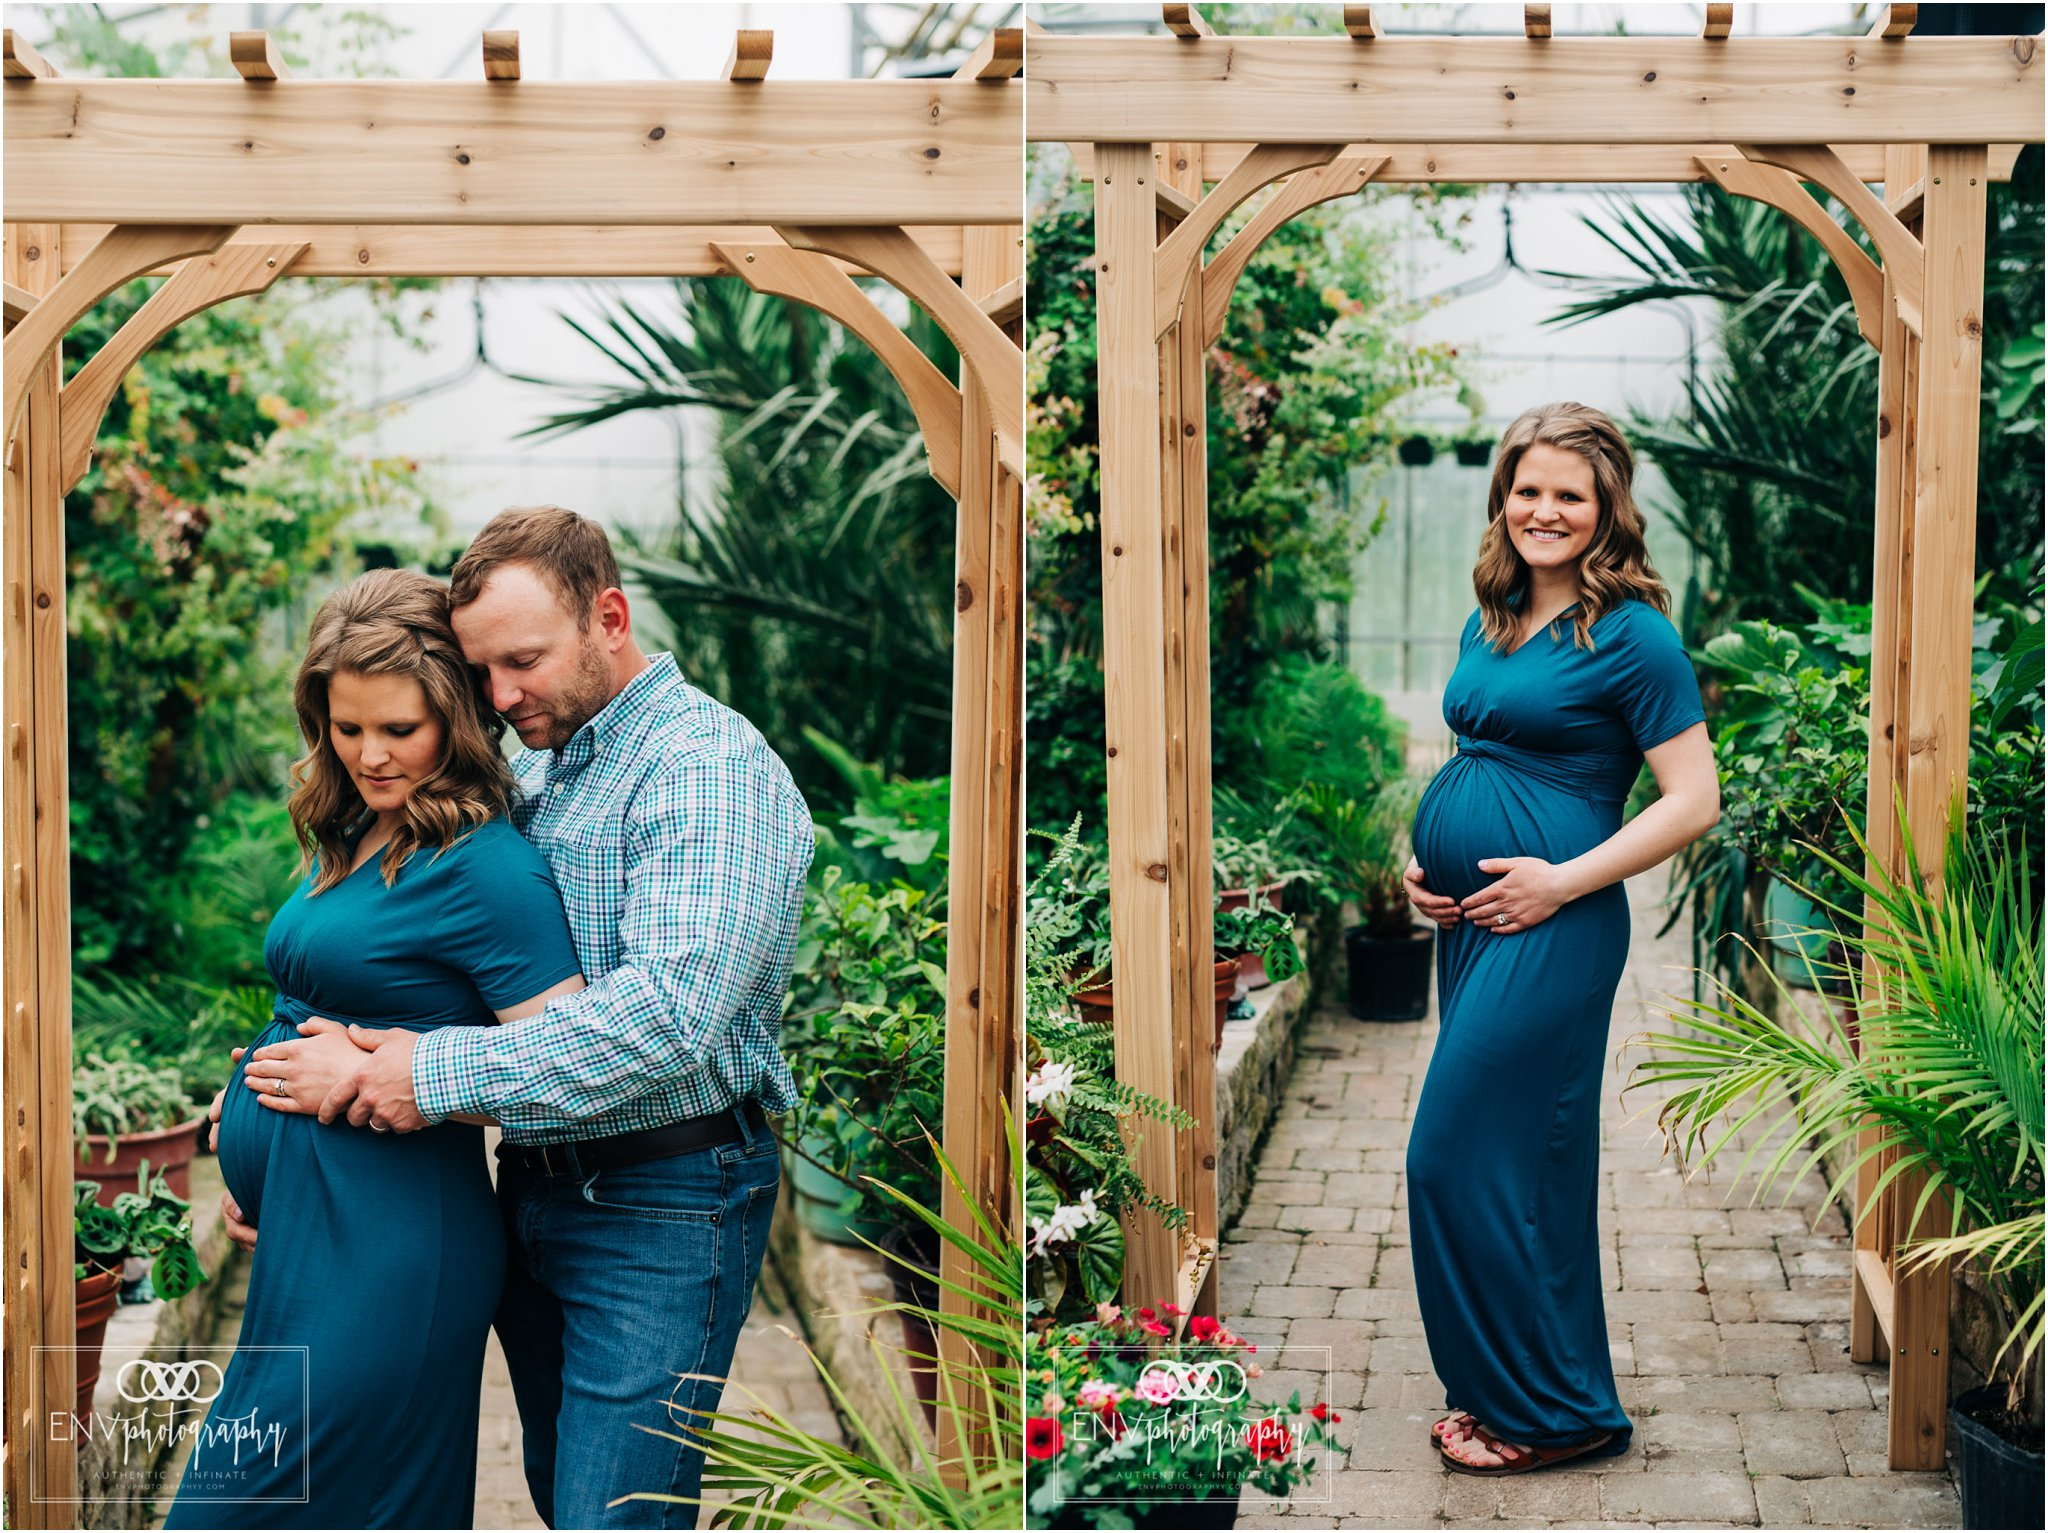 mount vernon columbus mansfield ohio maternity newborn photographer mohican gardens (15).jpg